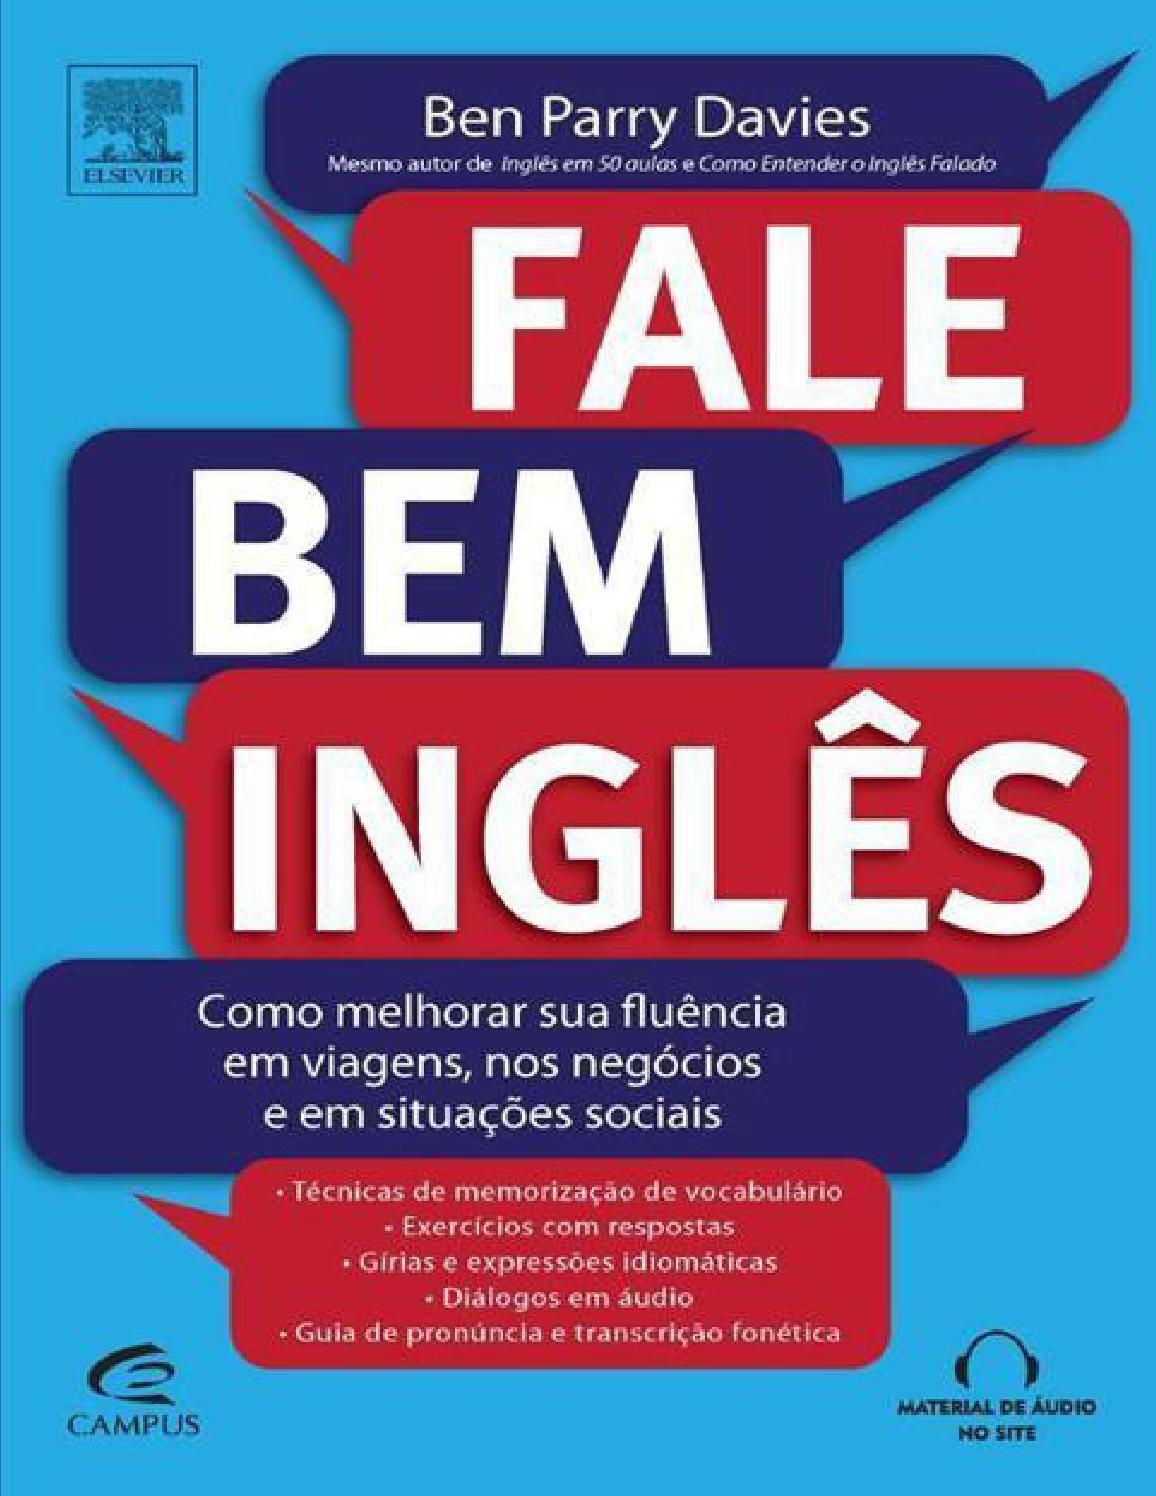 Fale Bem Ingles Ben Parry Davies Ingleses Perguntas Em Ingles E